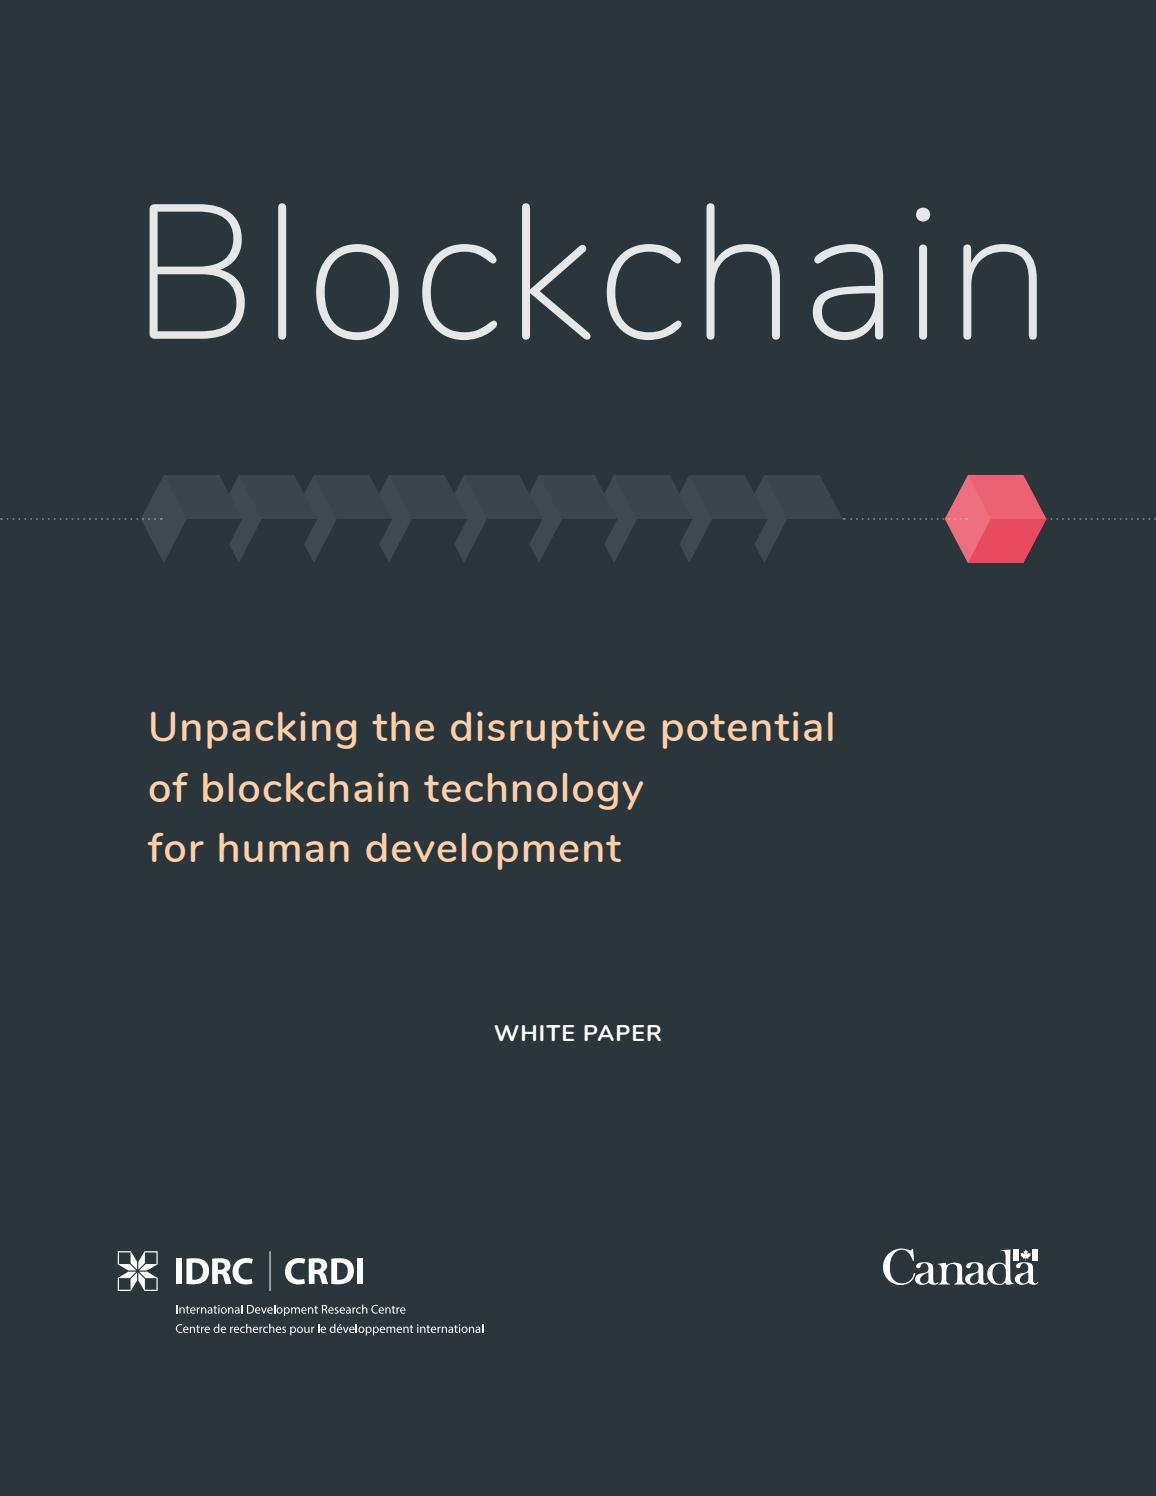 Blockchain: Unpacking the disruptive potential of blockchain